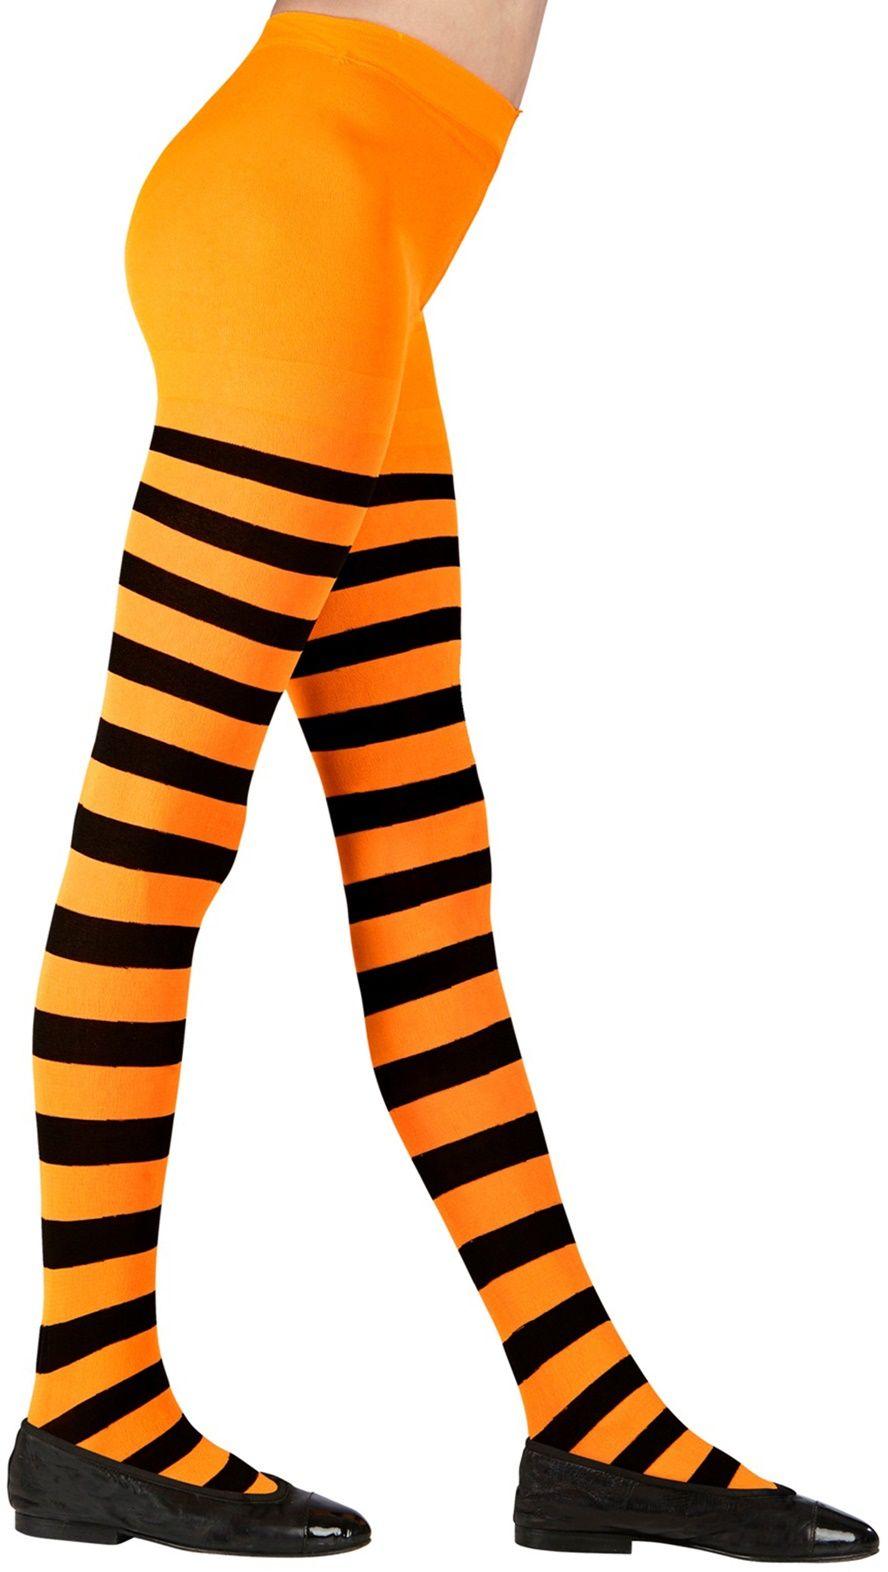 Oranje zwart gestreepte kinderpanty